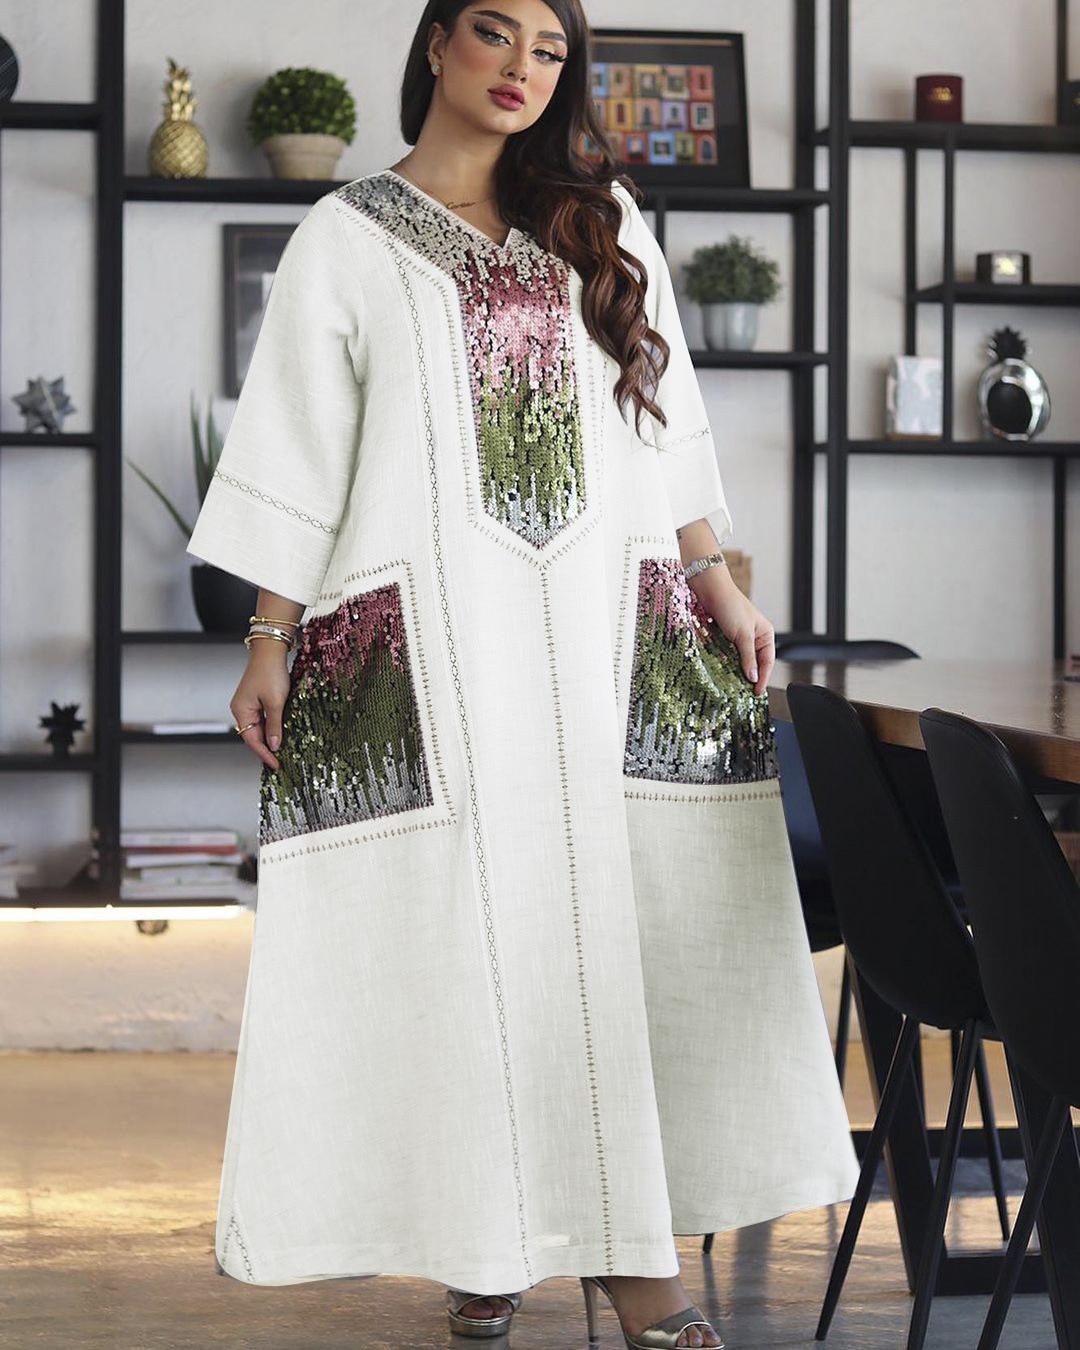 Vestido Abaya bordado de lentejuelas para mujer, vestido musulmán árabe de Omán,...